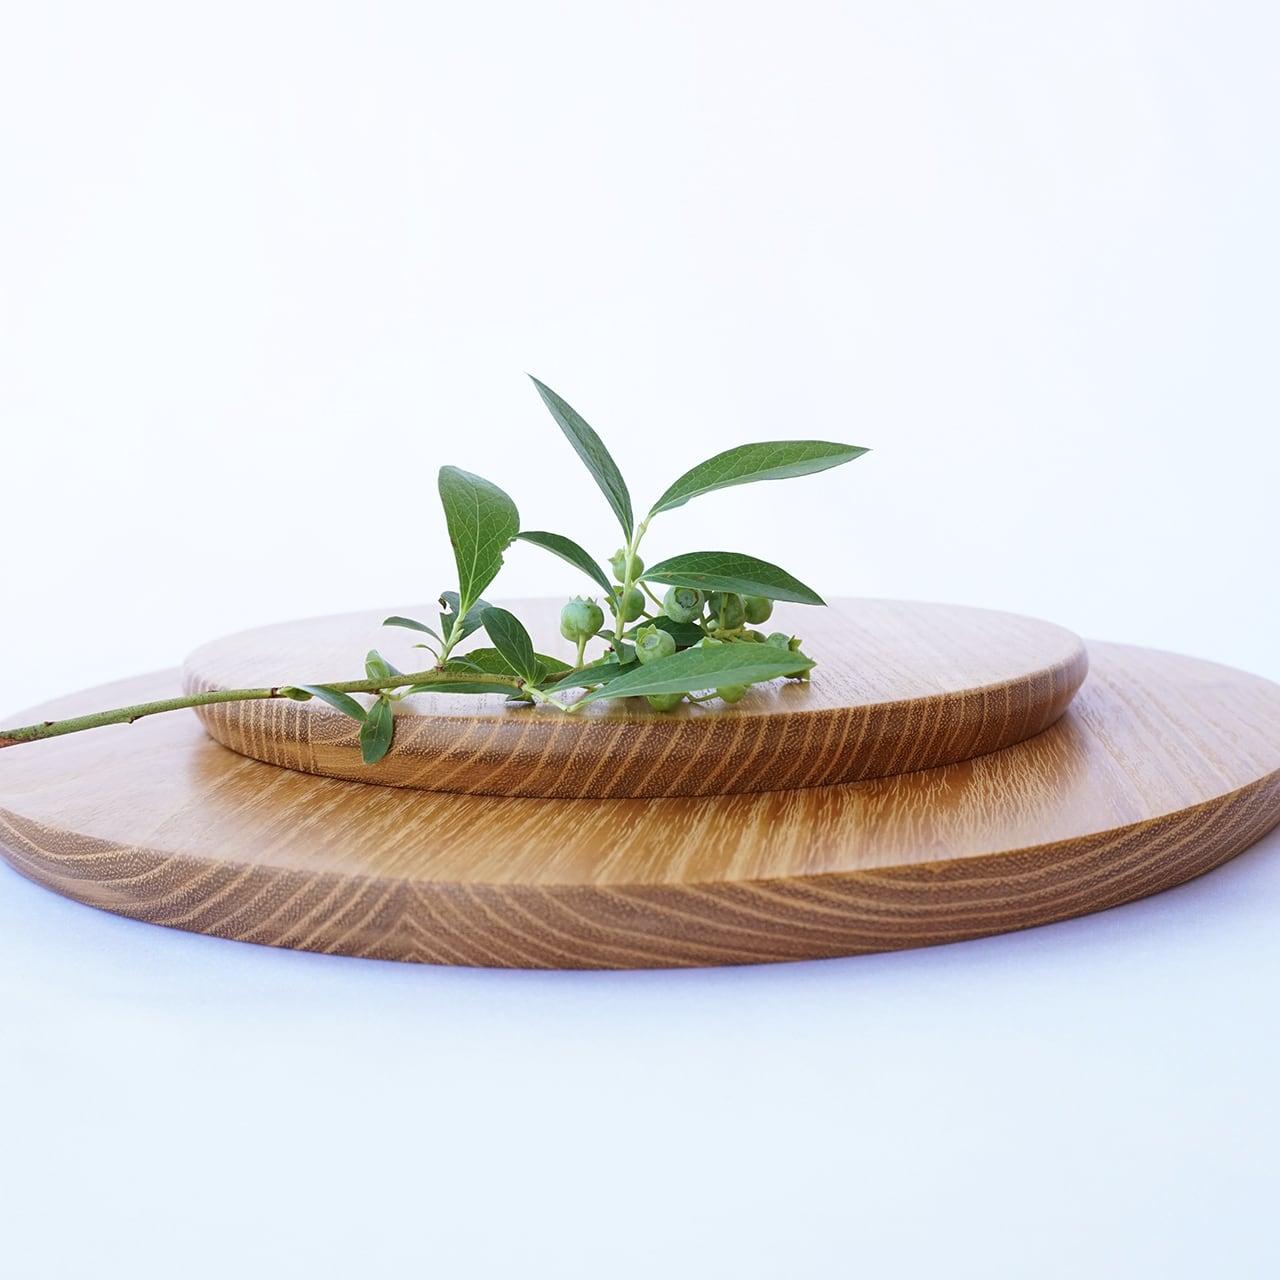 Cutting Board(S)akasia